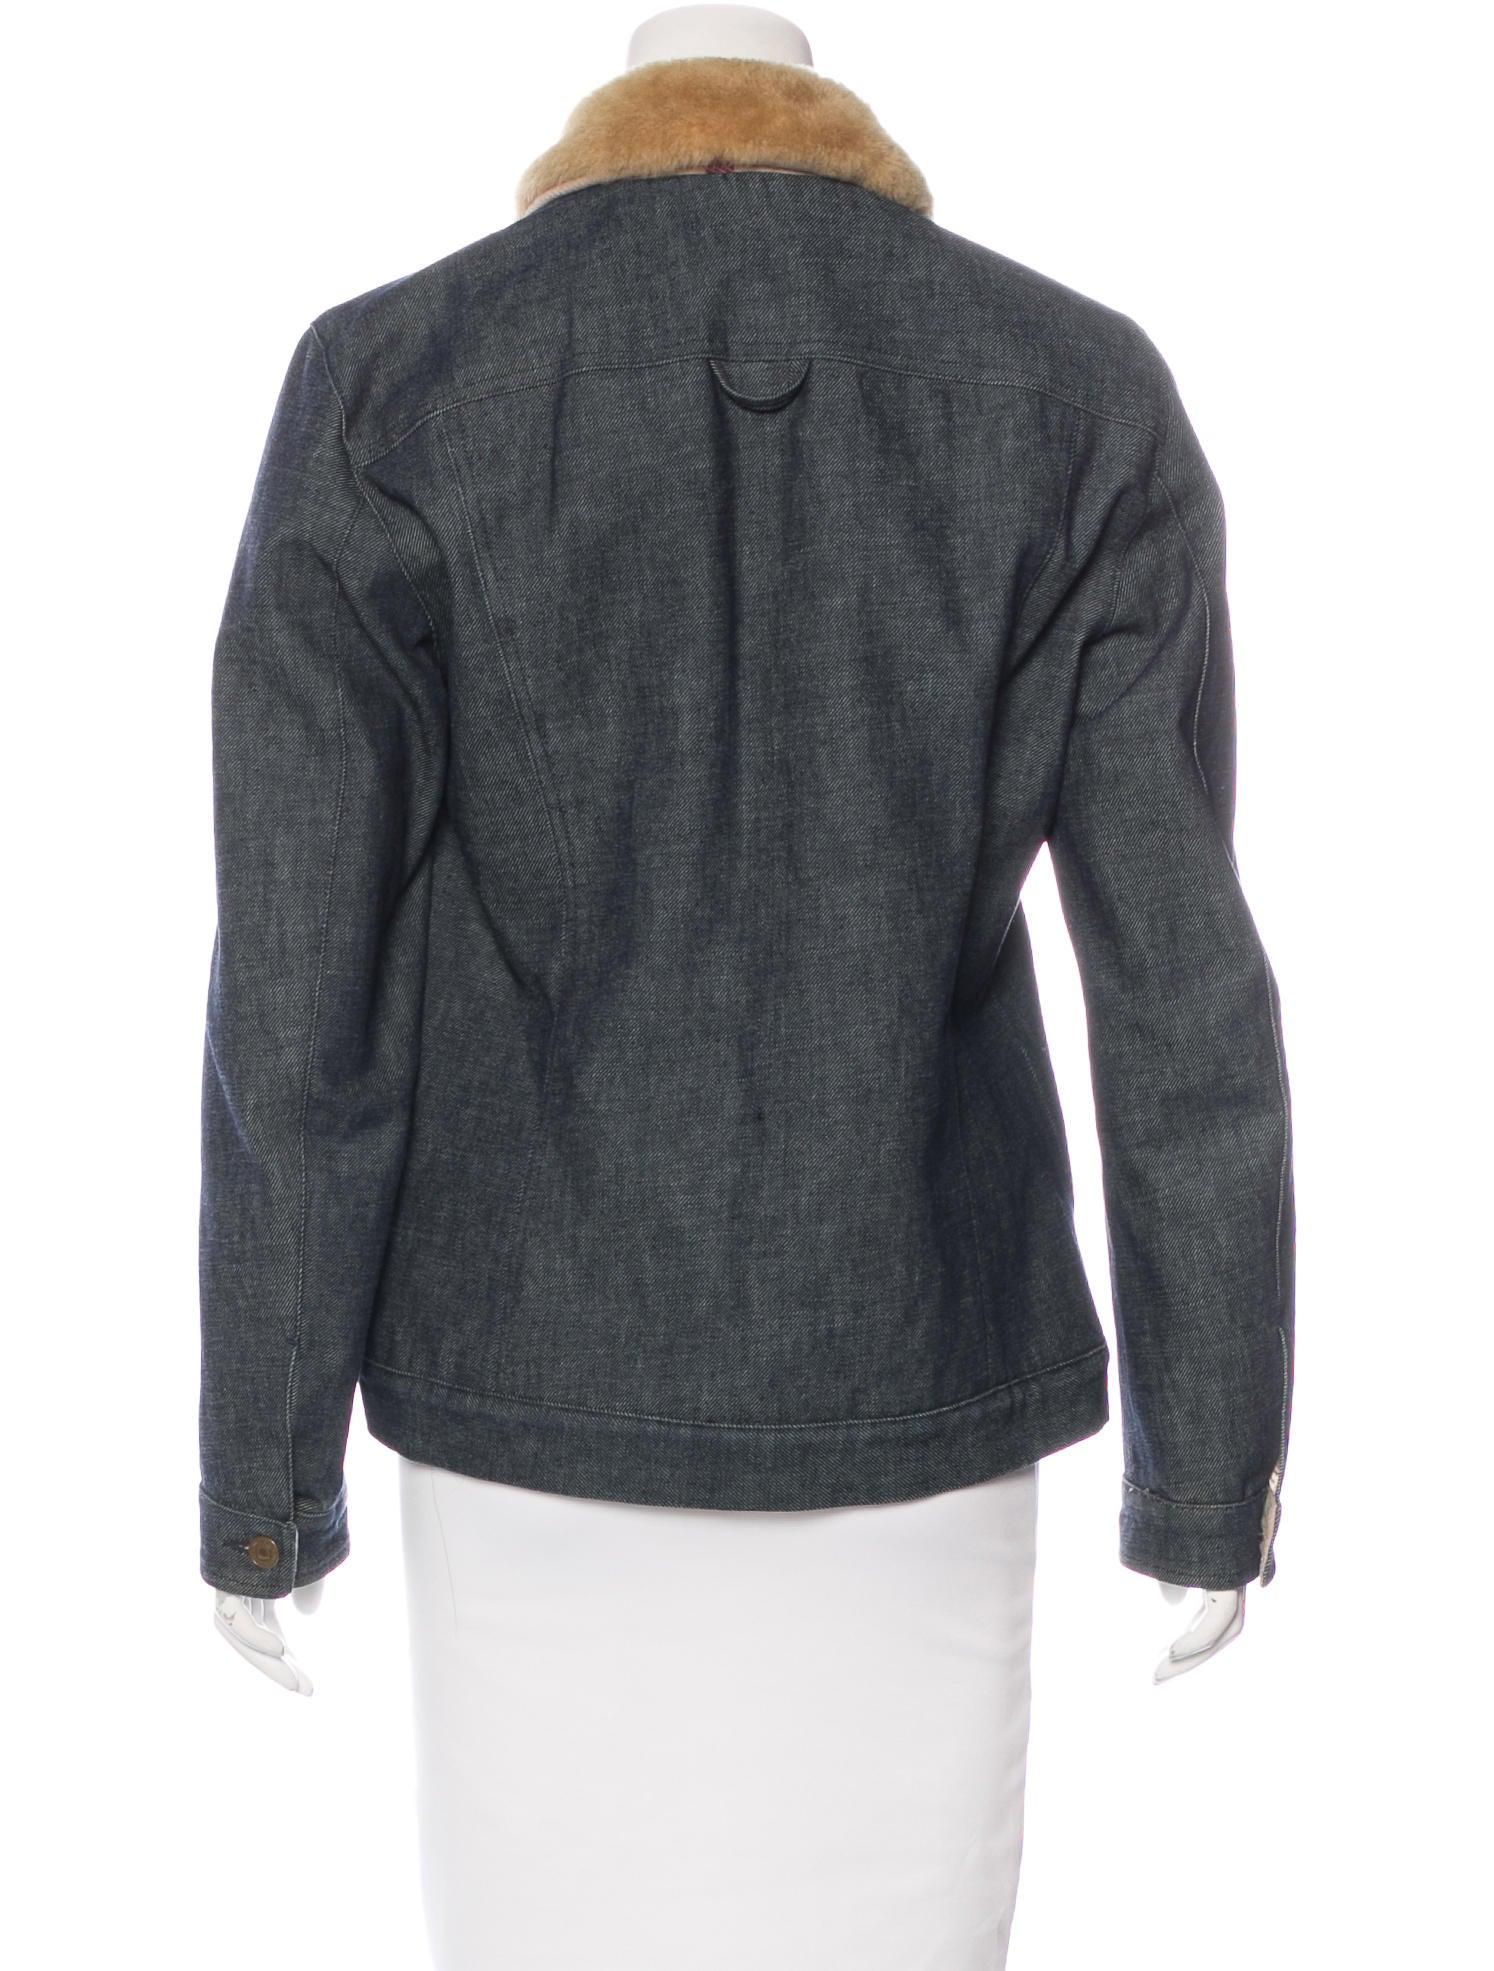 Burberry London Wool Lined Denim Jacket Clothing